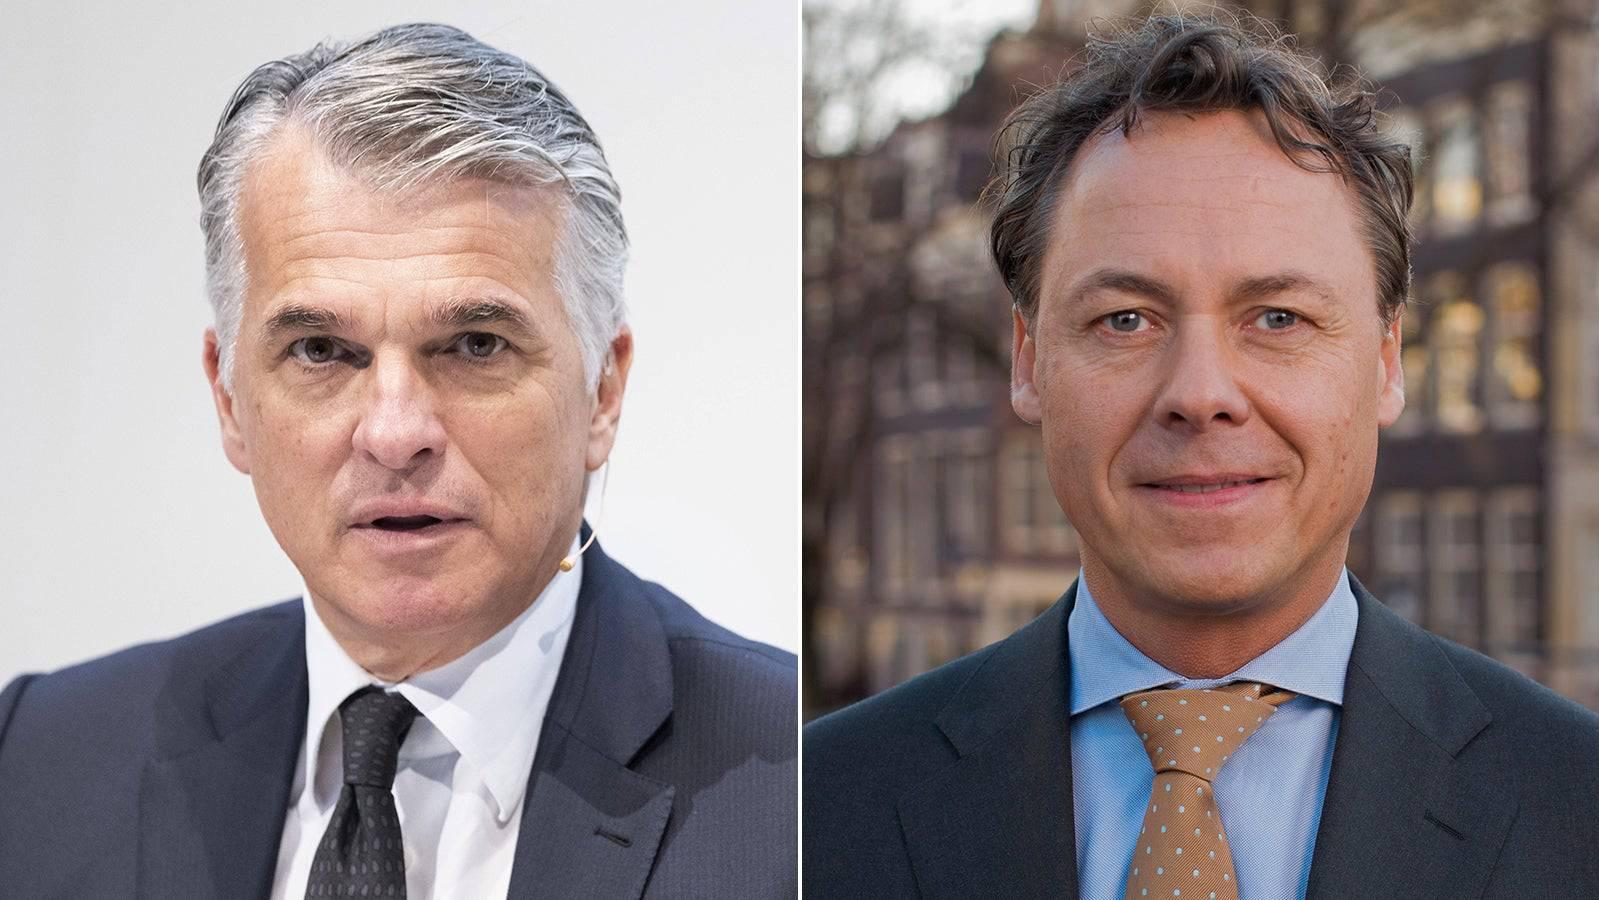 Tritt im Herbst ab: UBS-CEO Sergio Ermotti (links). Übernimmt: Ralph Hamers.